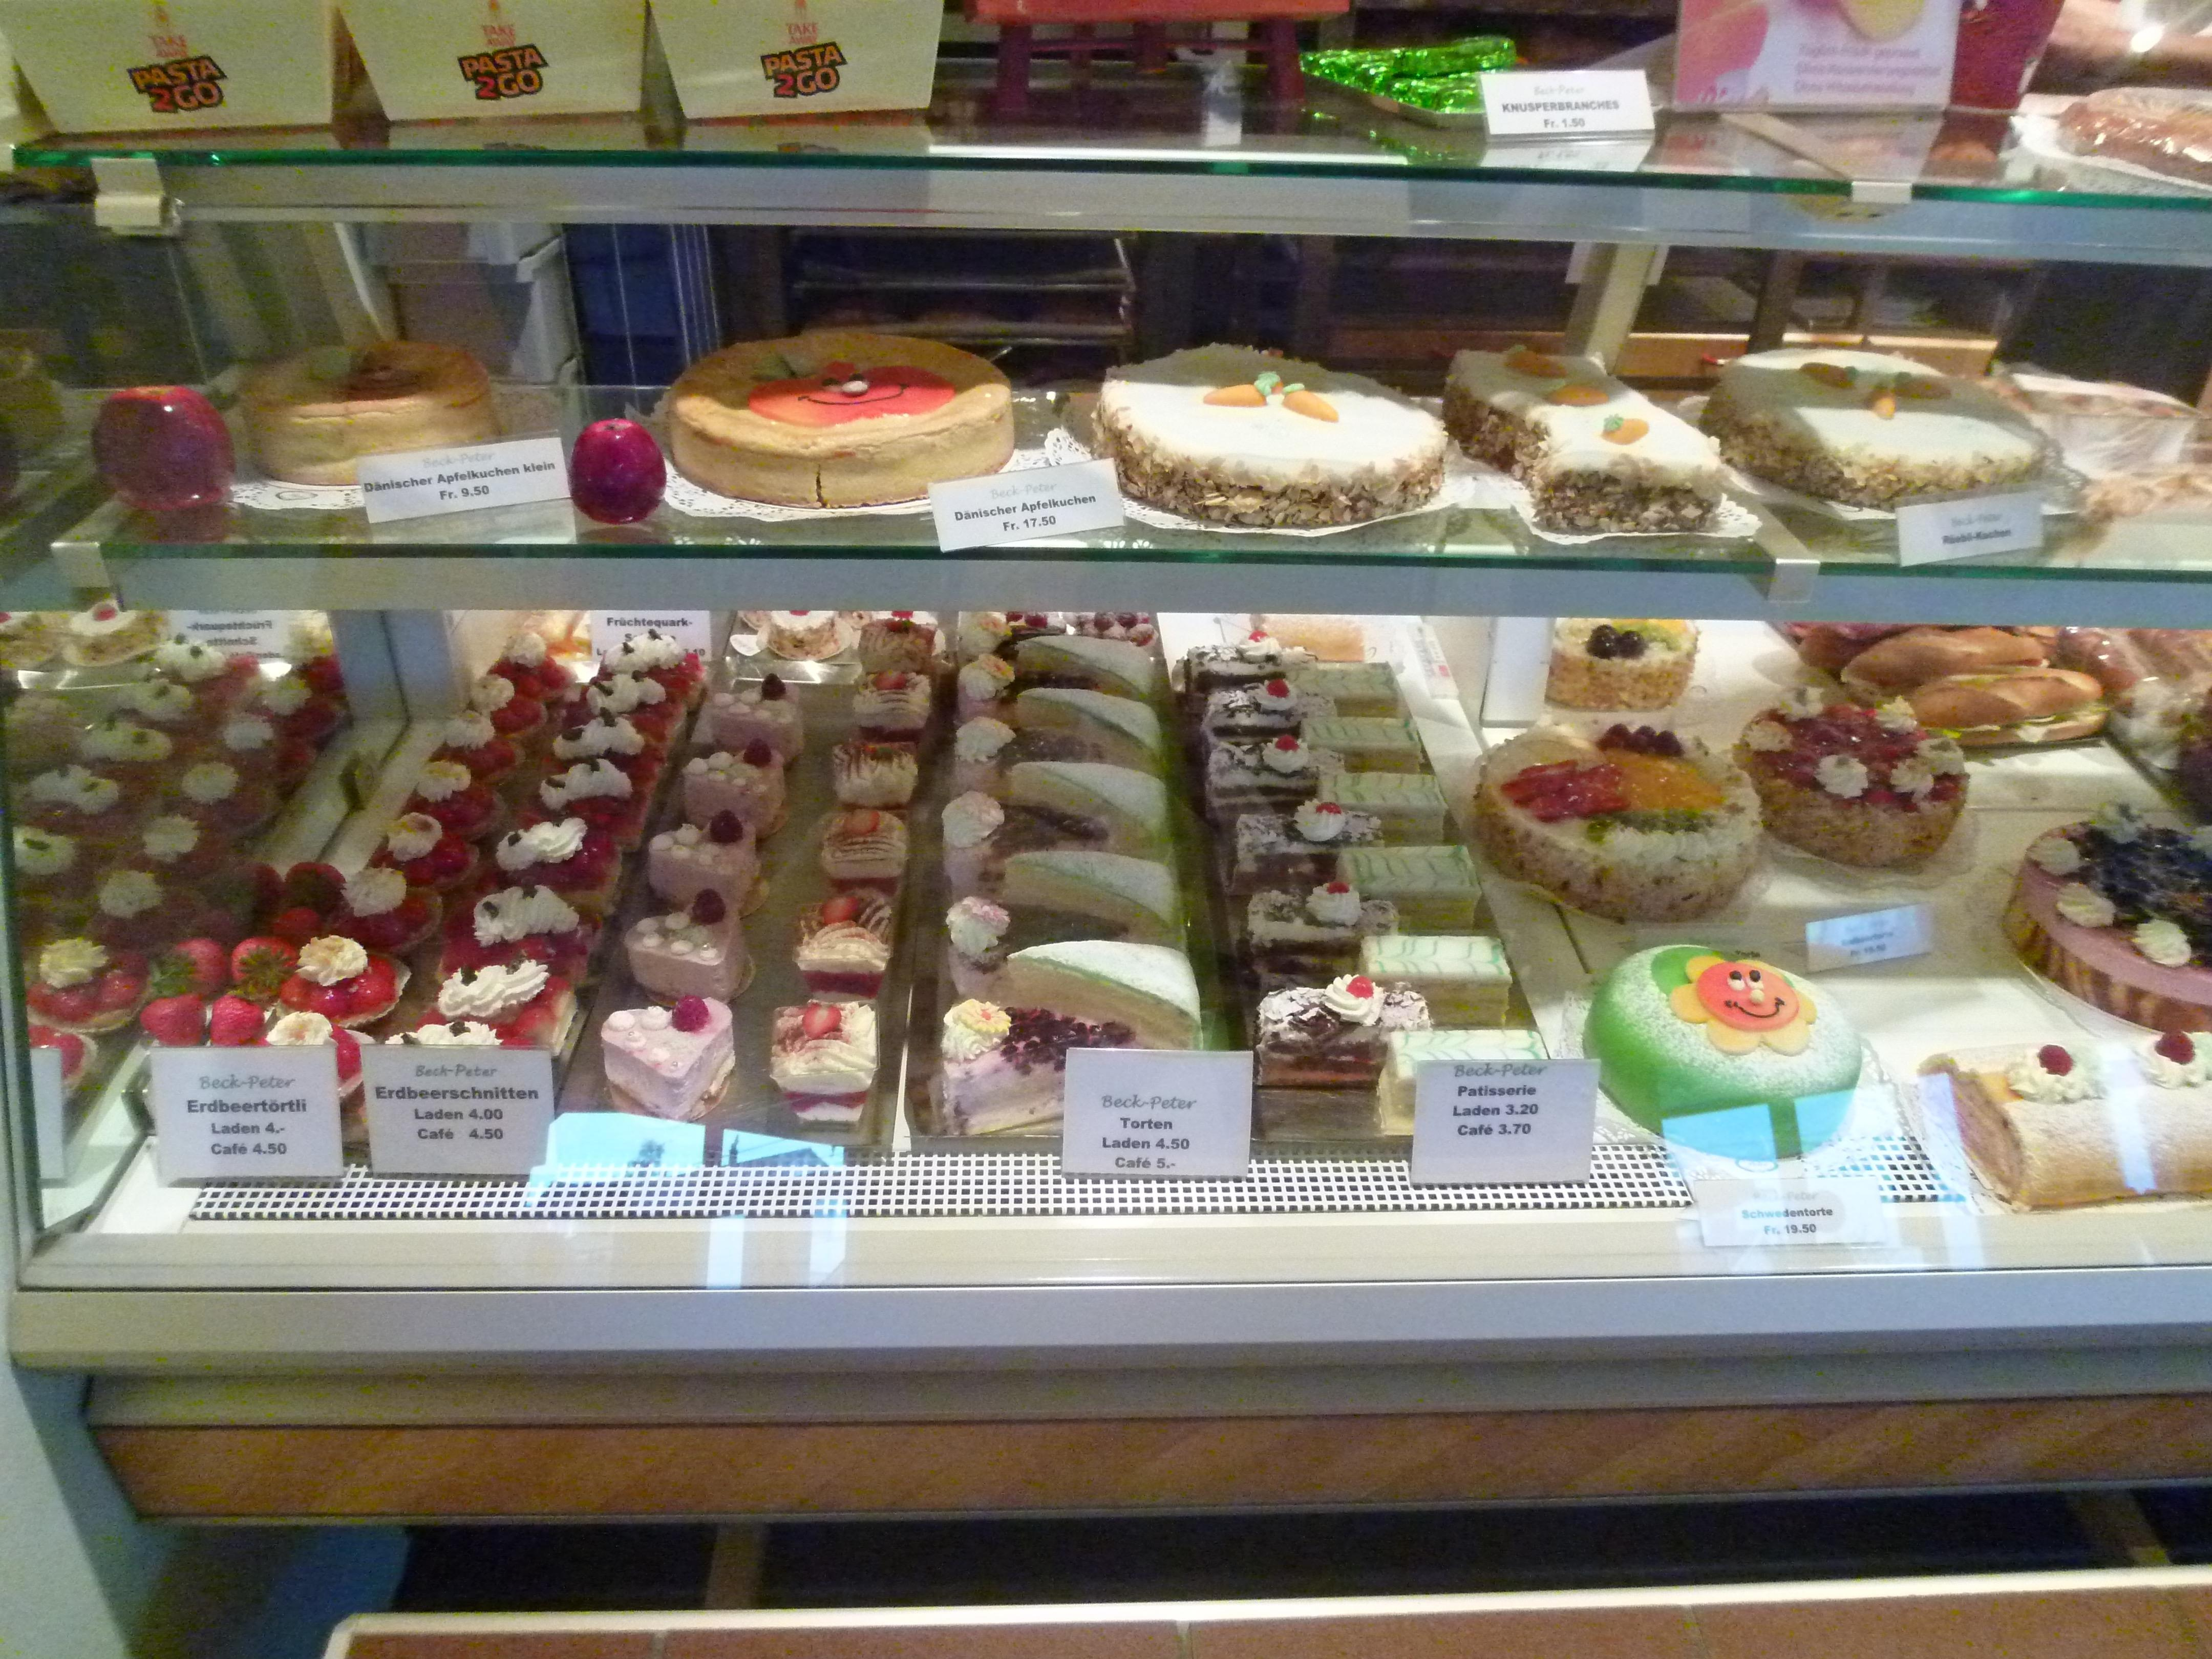 Bäckerei-Konditorei-Café Peter